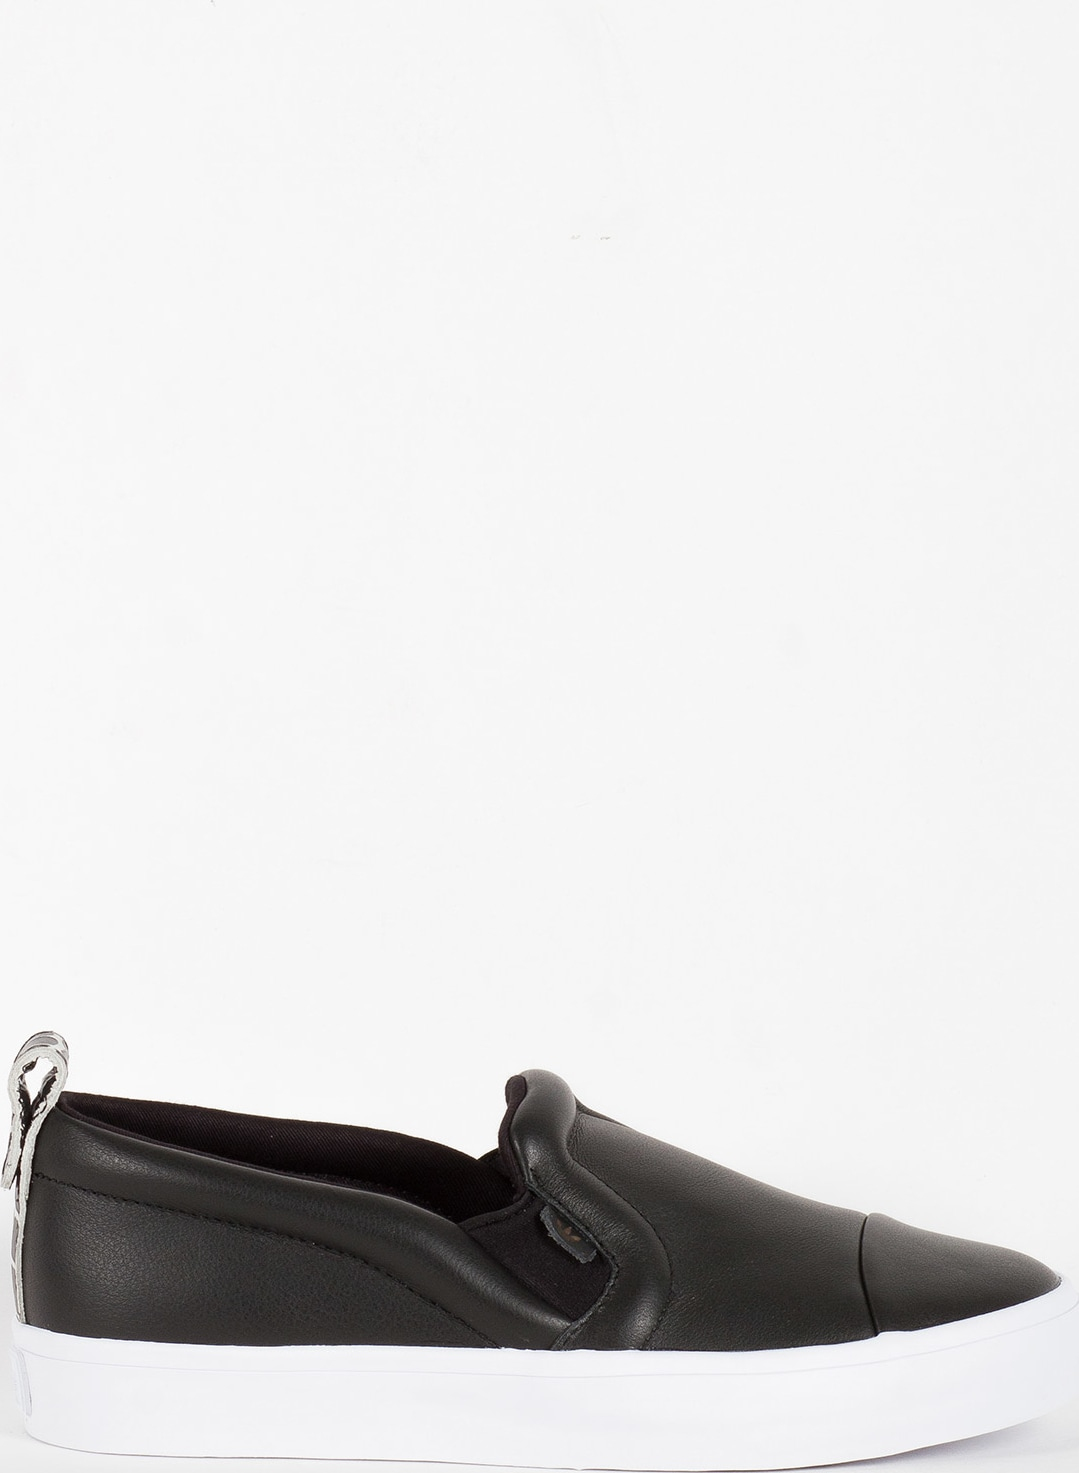 huge discount 203fc d9c1c adidas Originals. Honey 2.0 Slip-On Sneakers - Core Black White